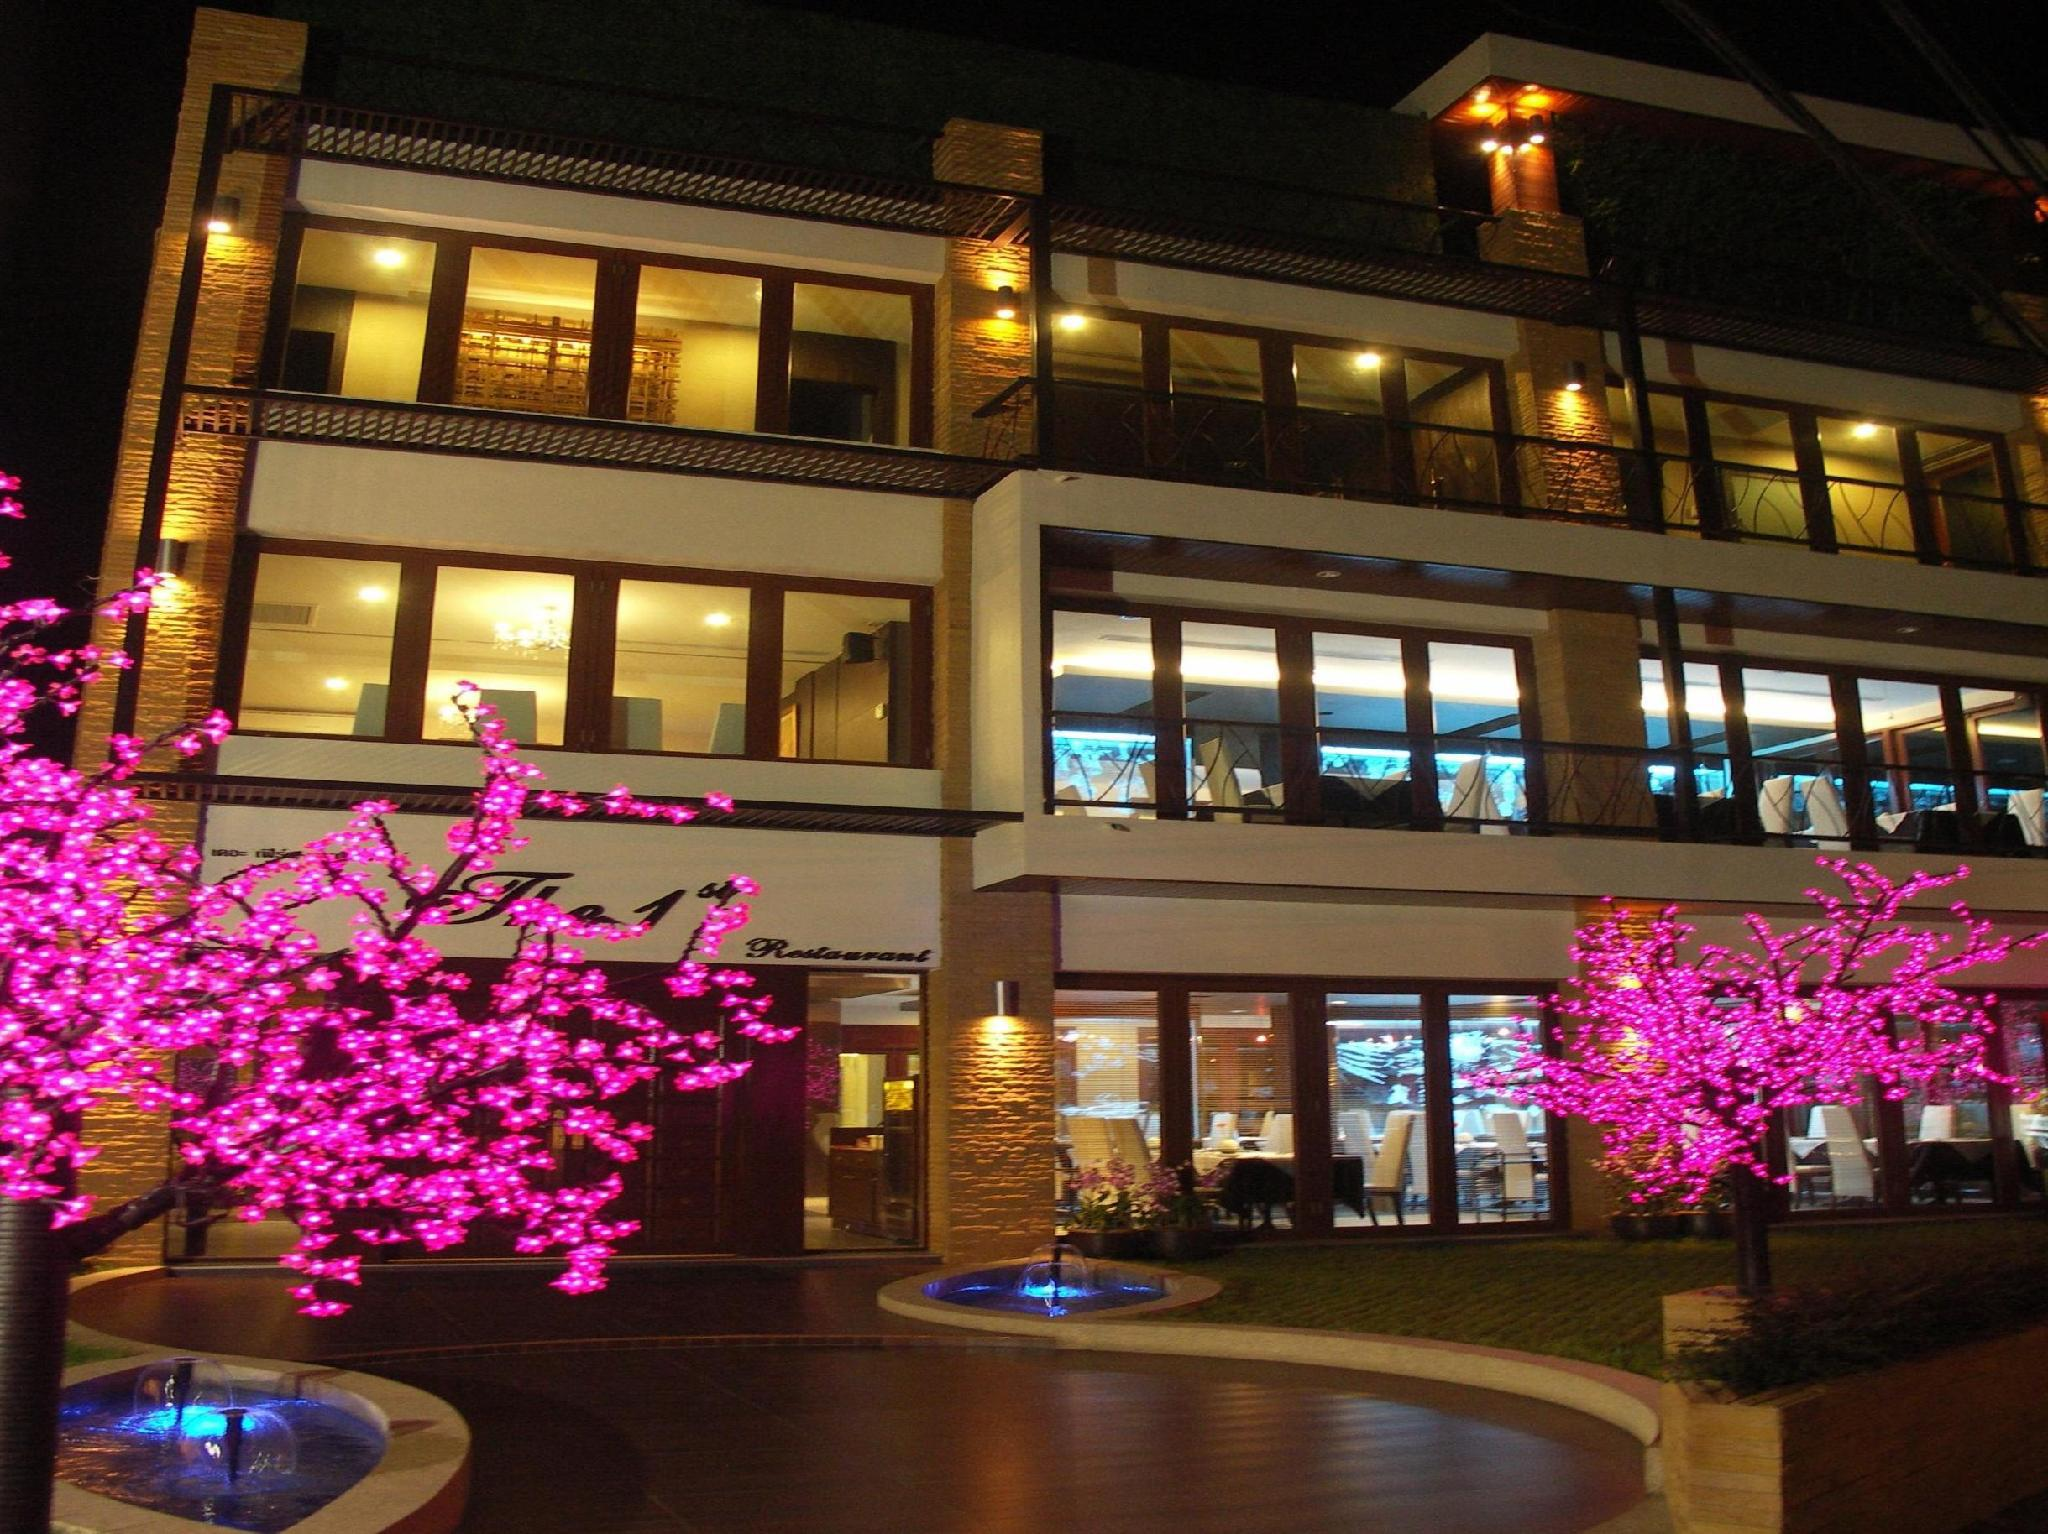 The Residence Airport & Spa Hotel โรงแรม เดอะ เรสซิเดนซ์ แอร์พอร์ต แอนด์ สปา